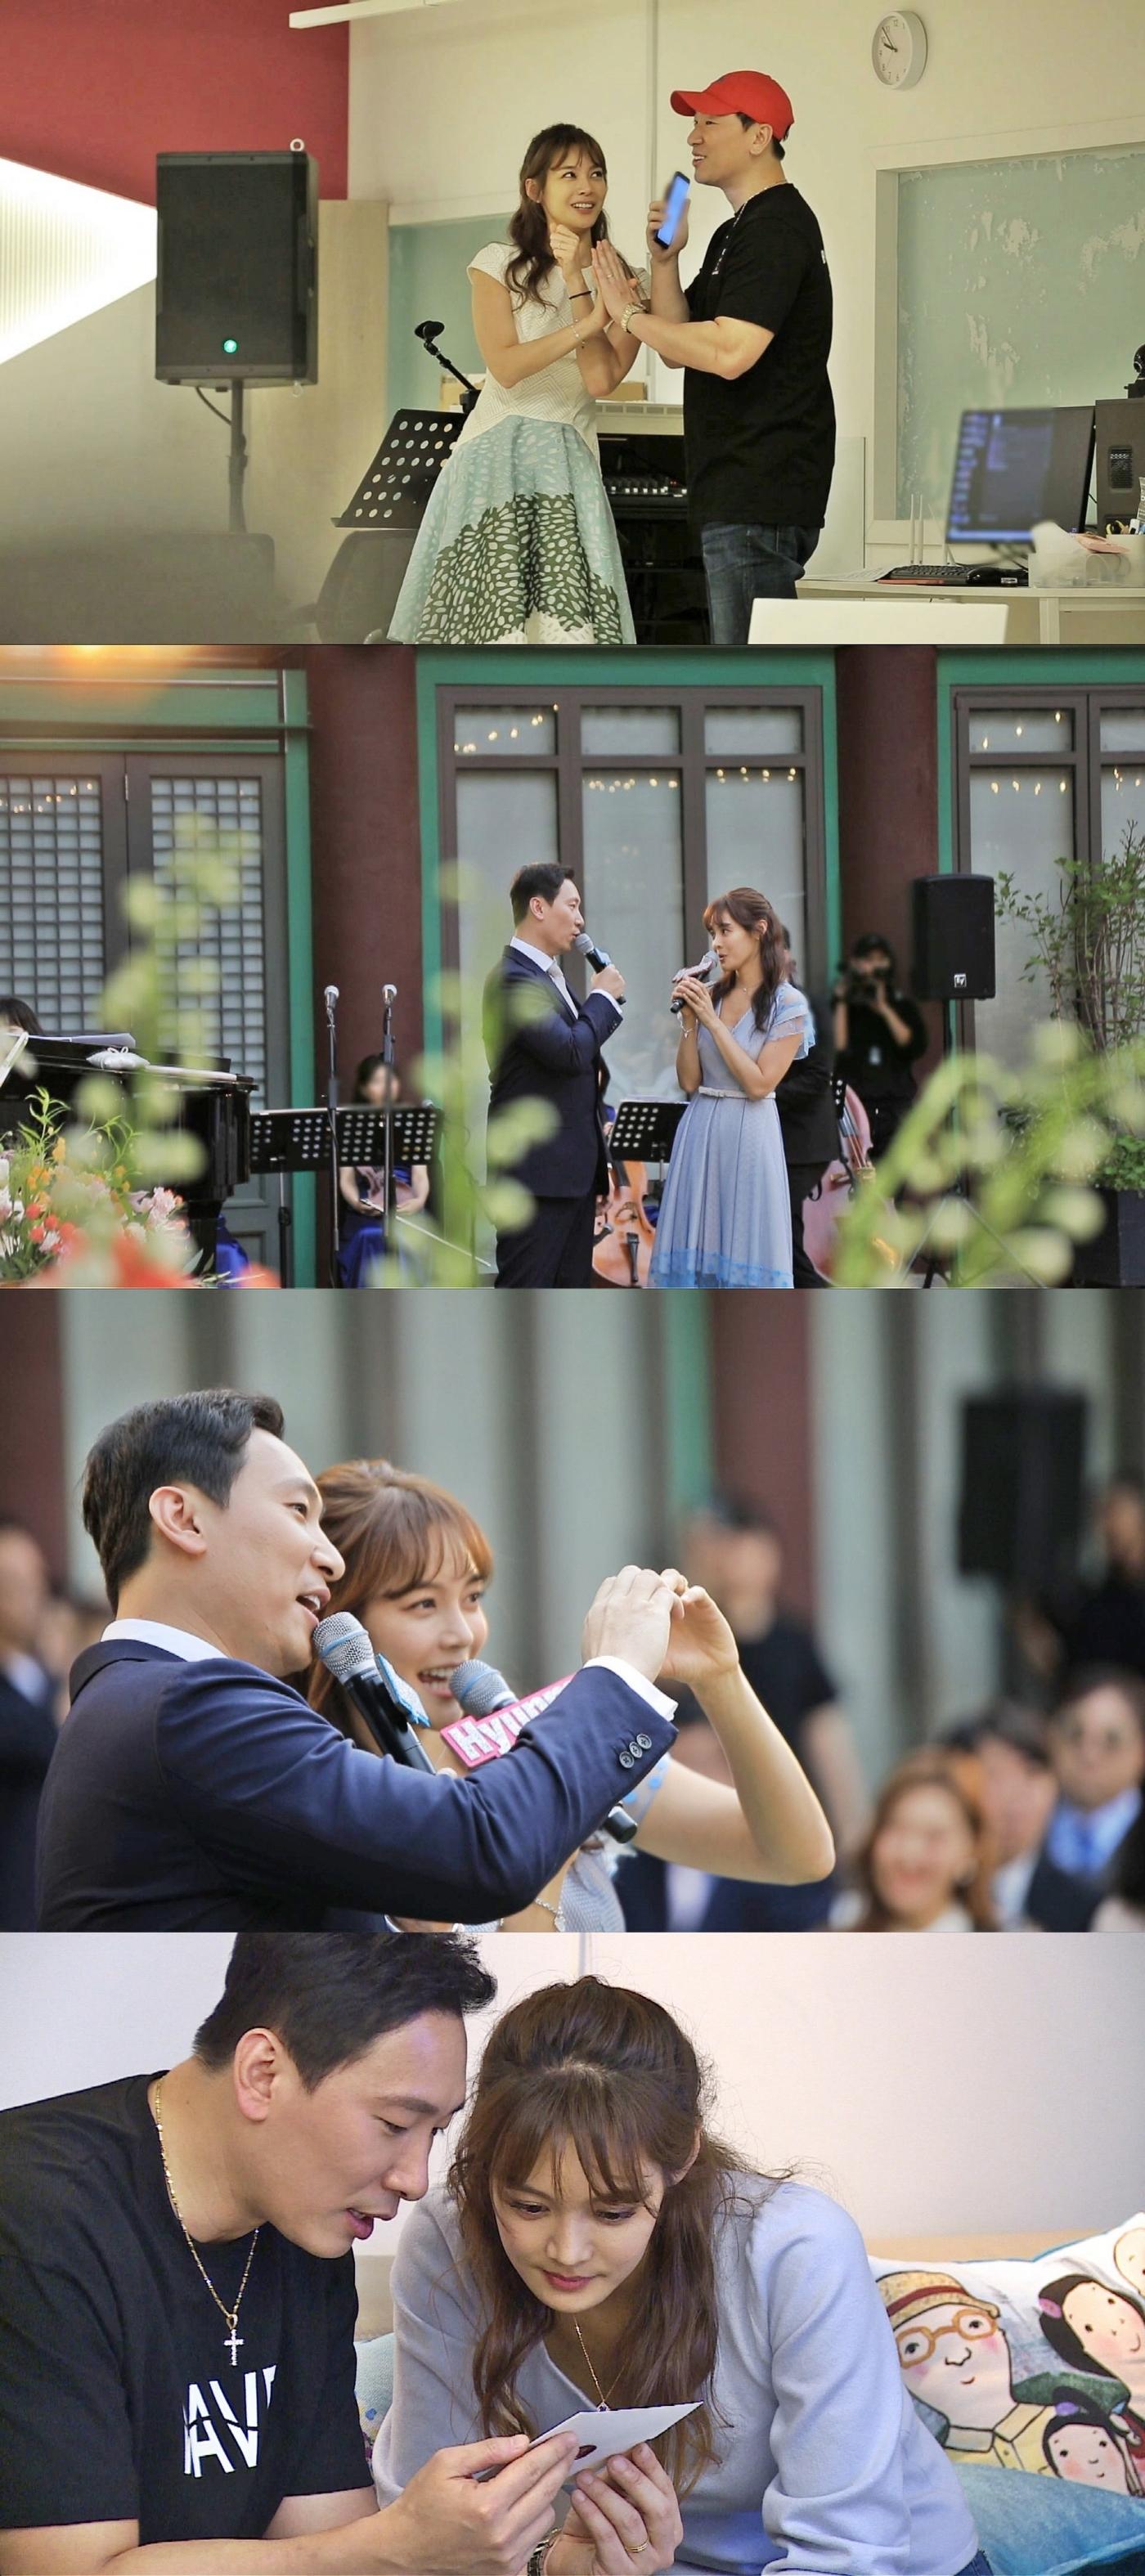 [N컷] '동상이몽2' 라이머♥안현모, 첫 부부 듀엣…노래 실력 공개